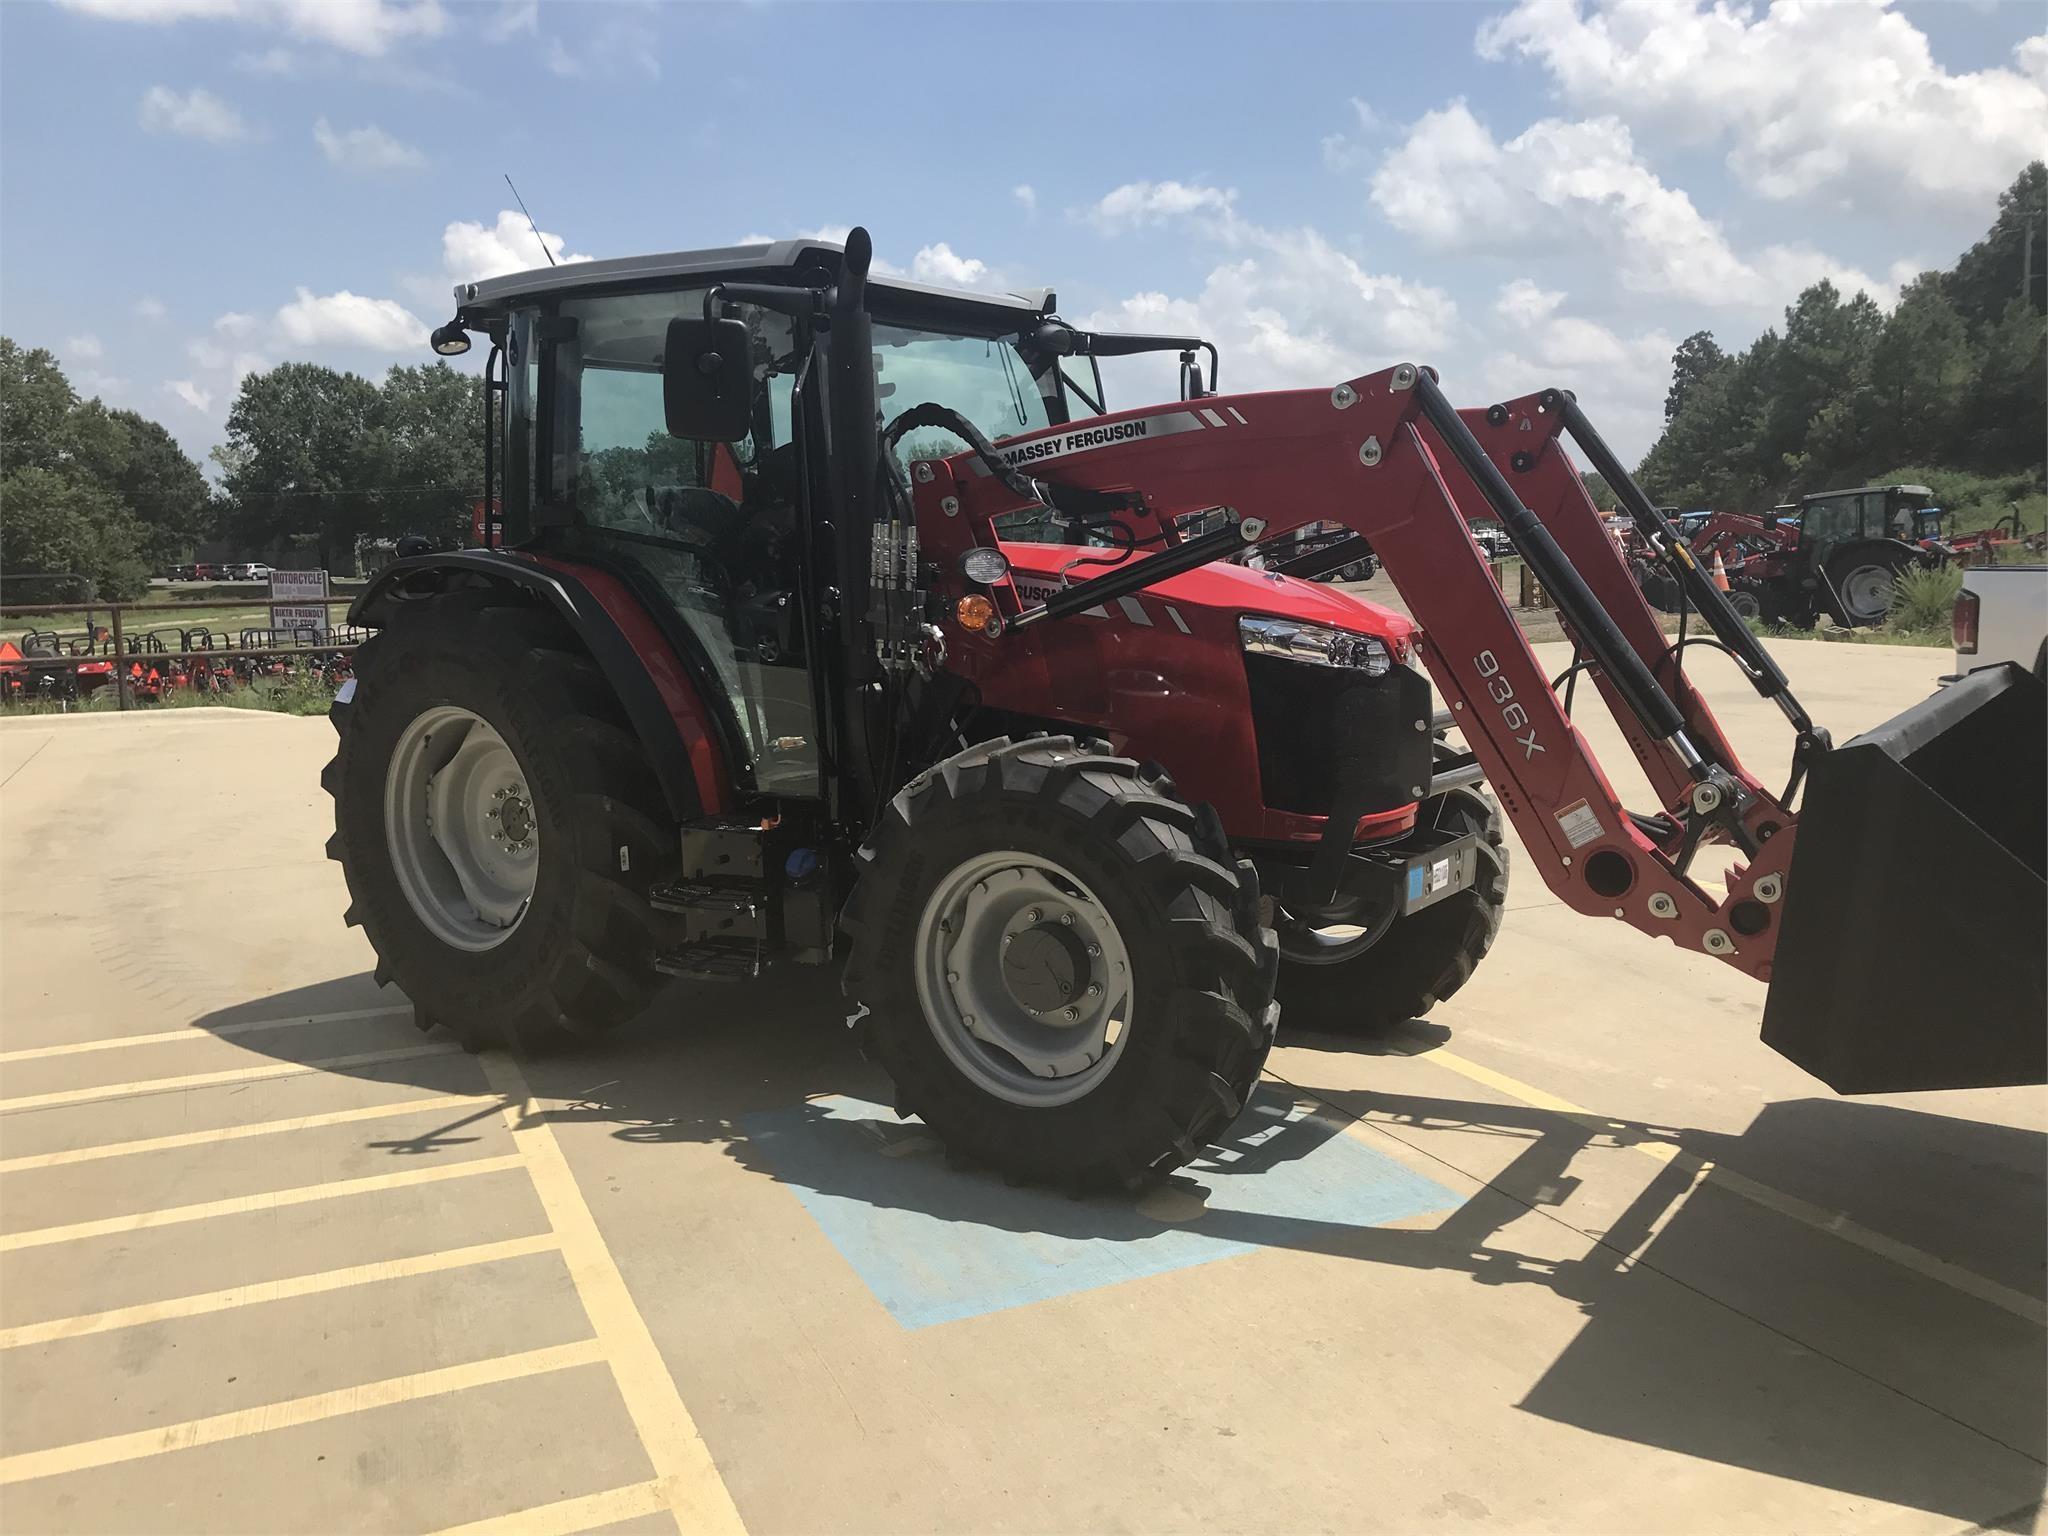 2021 Massey Ferguson 4707 Tractor